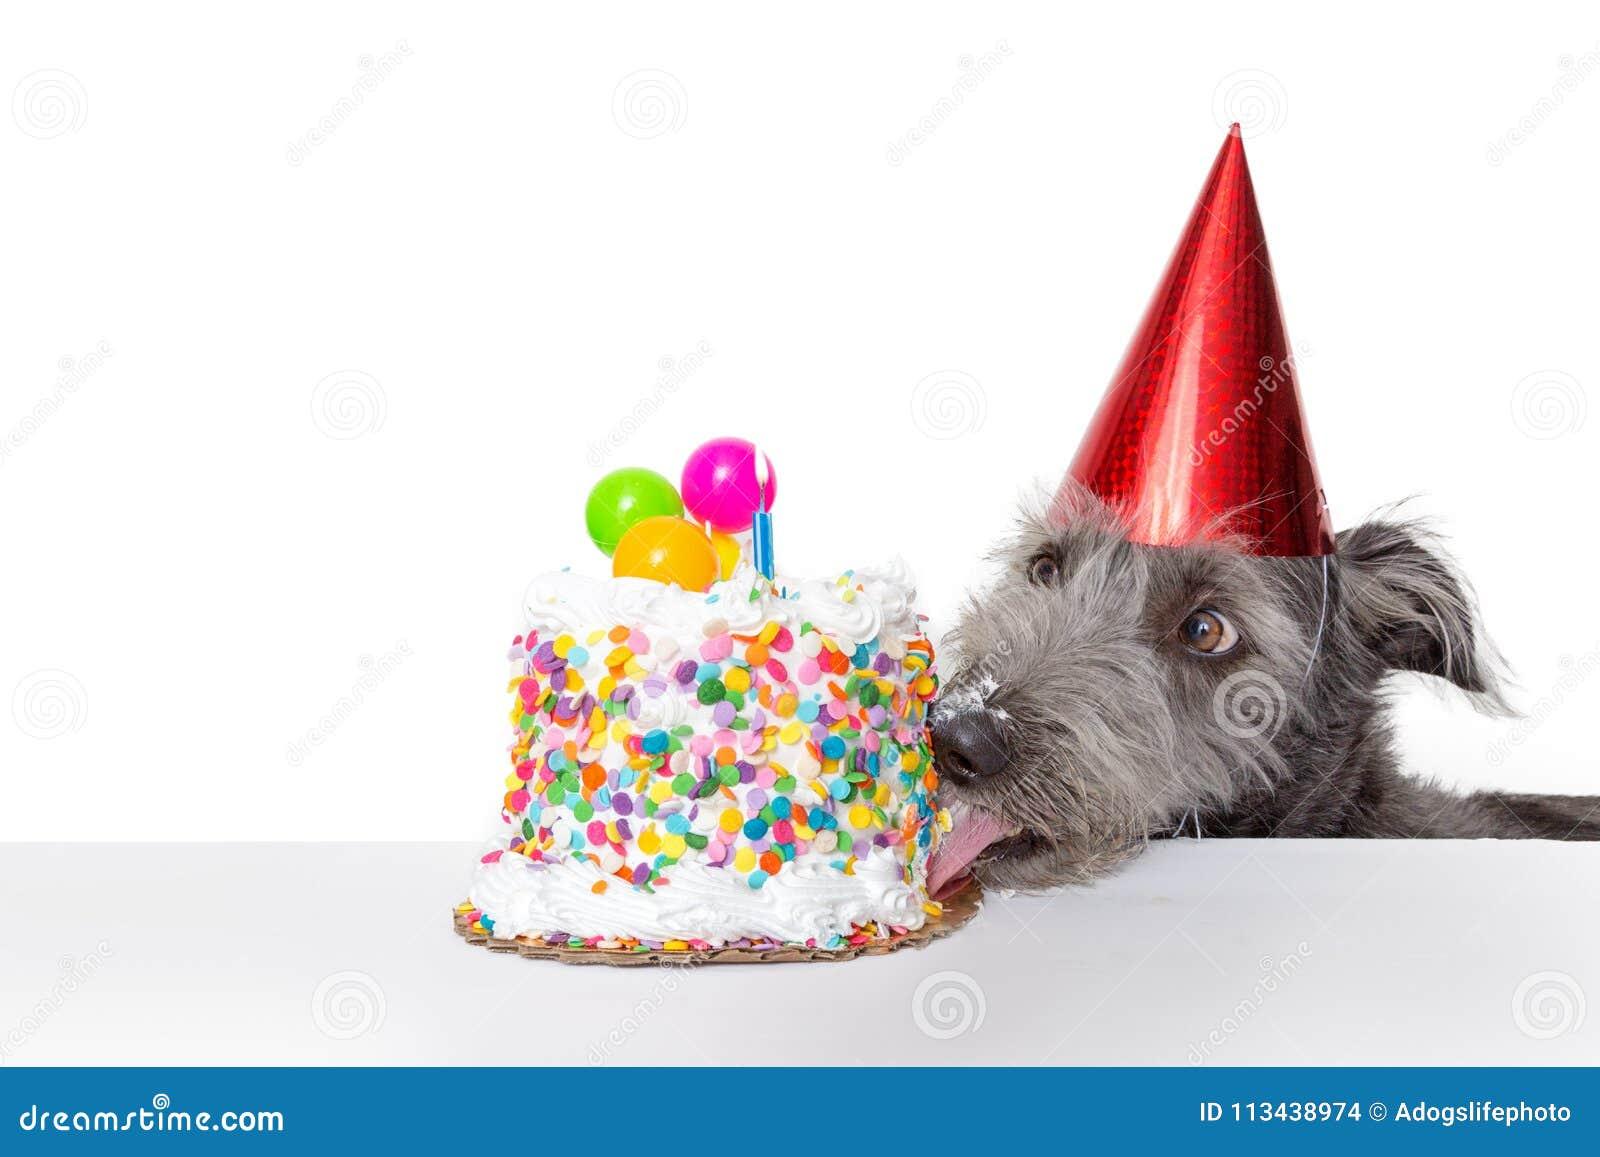 Fantastic Funny Birthday Dog Eating Cake Stock Photo Image Of Birthday Personalised Birthday Cards Veneteletsinfo